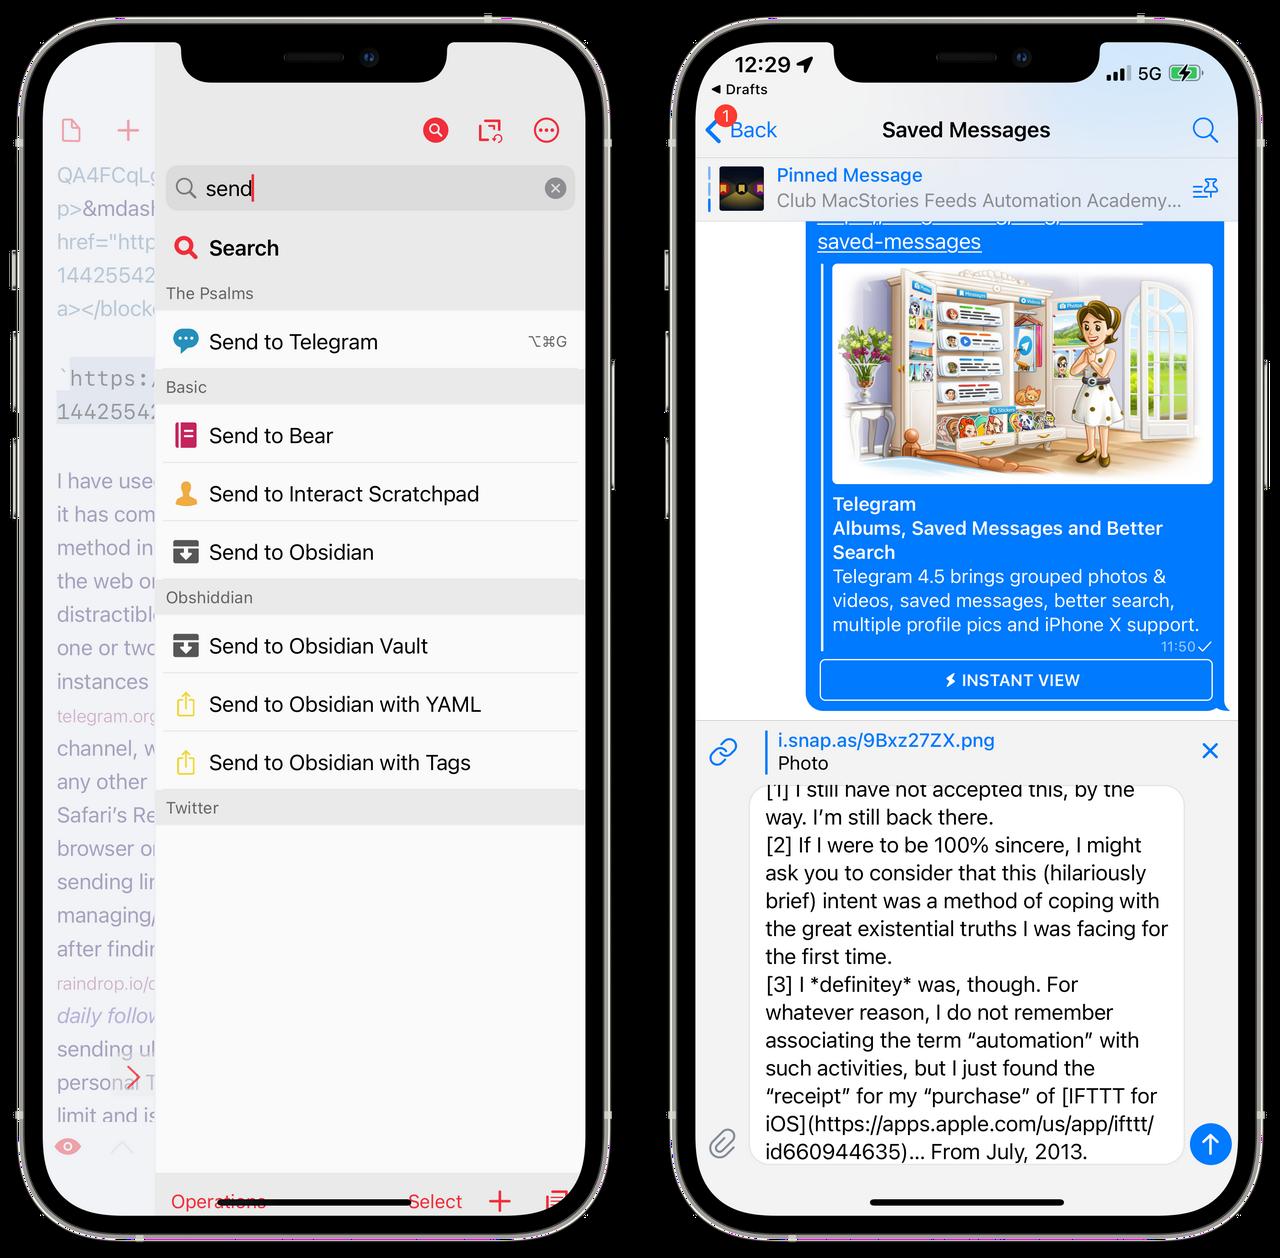 Send to Telegram Drafts Action